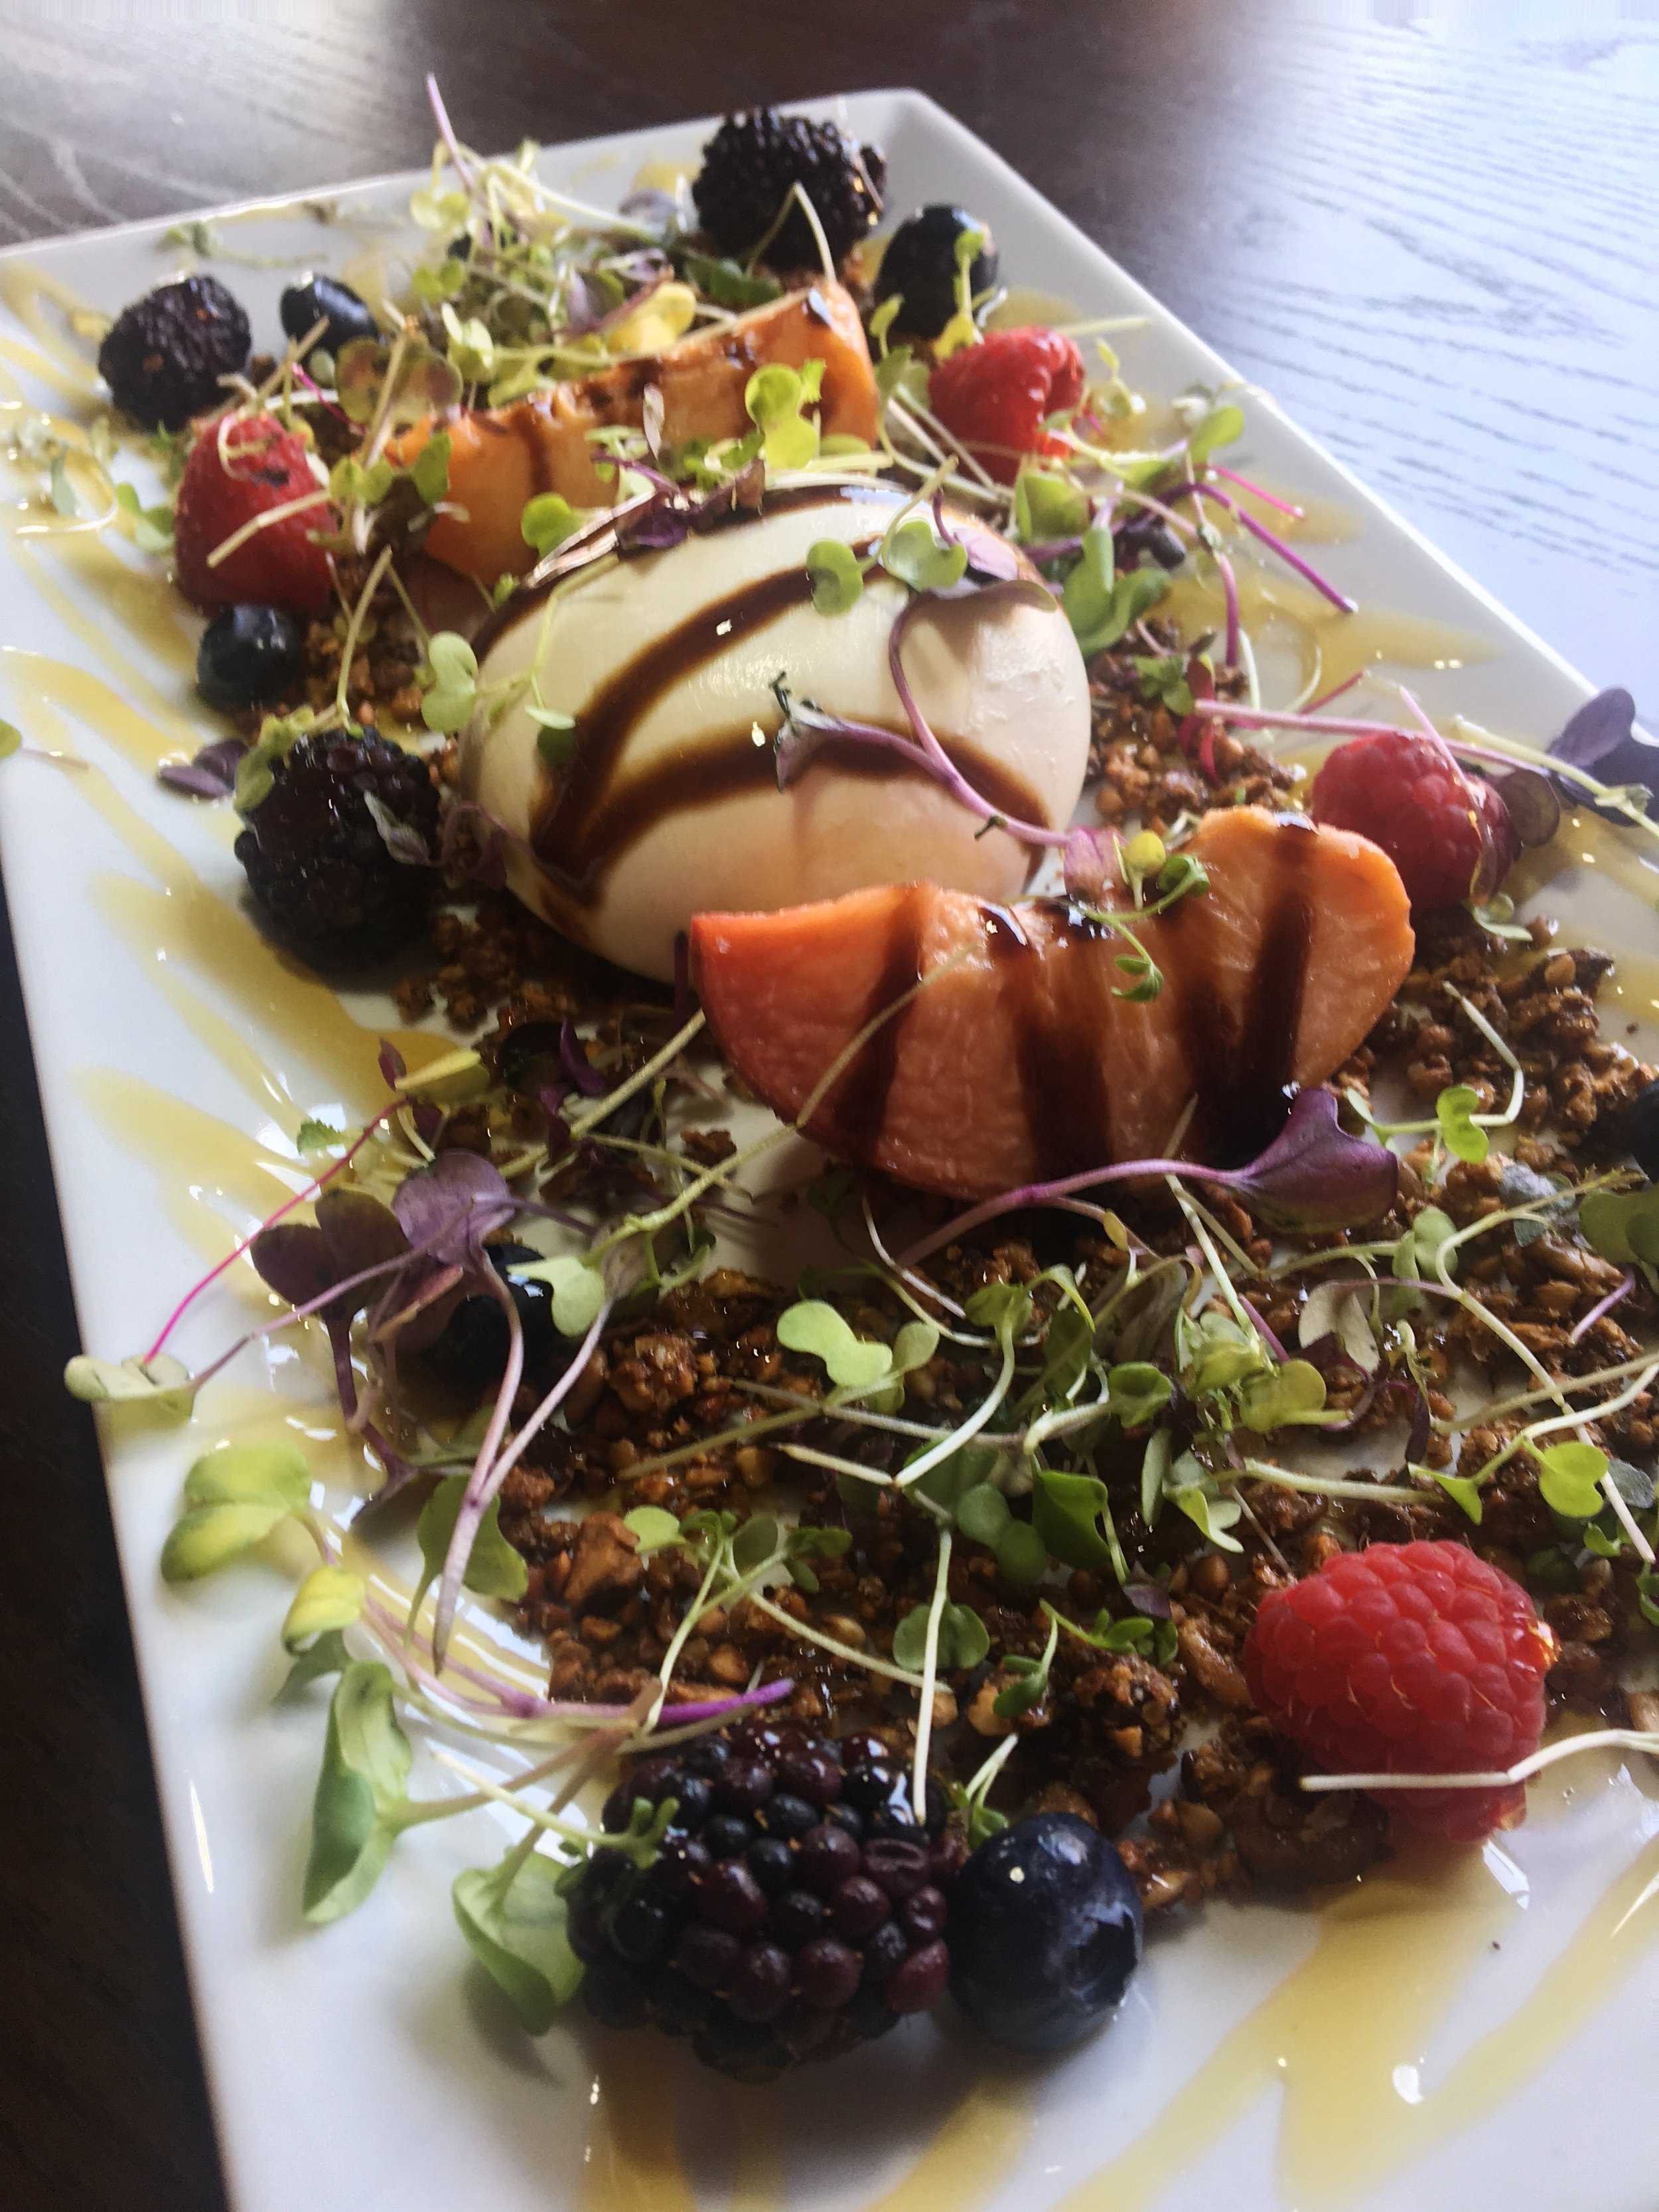 LI Fashionable Foodie - That Meetball Place Burrata Salad